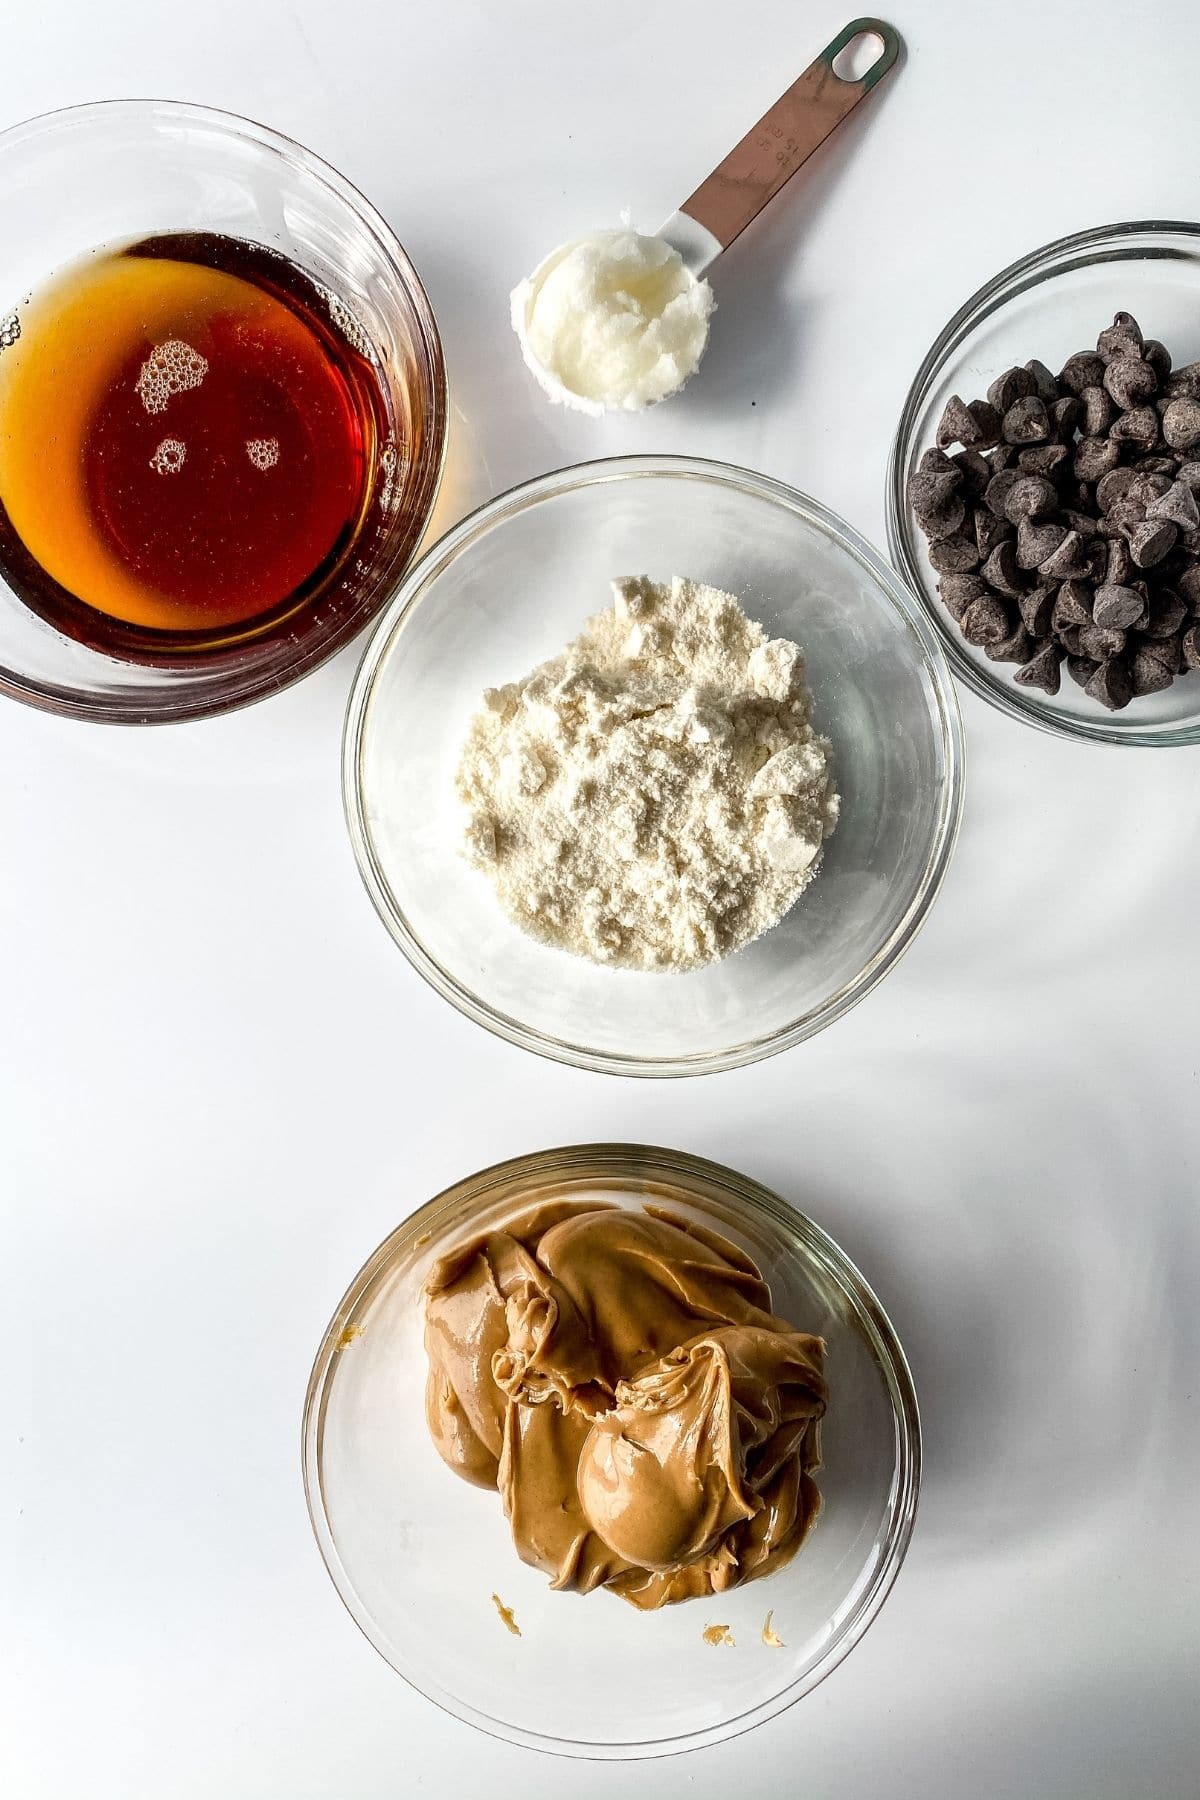 Ingredients vegan chocolate peanut butter balls